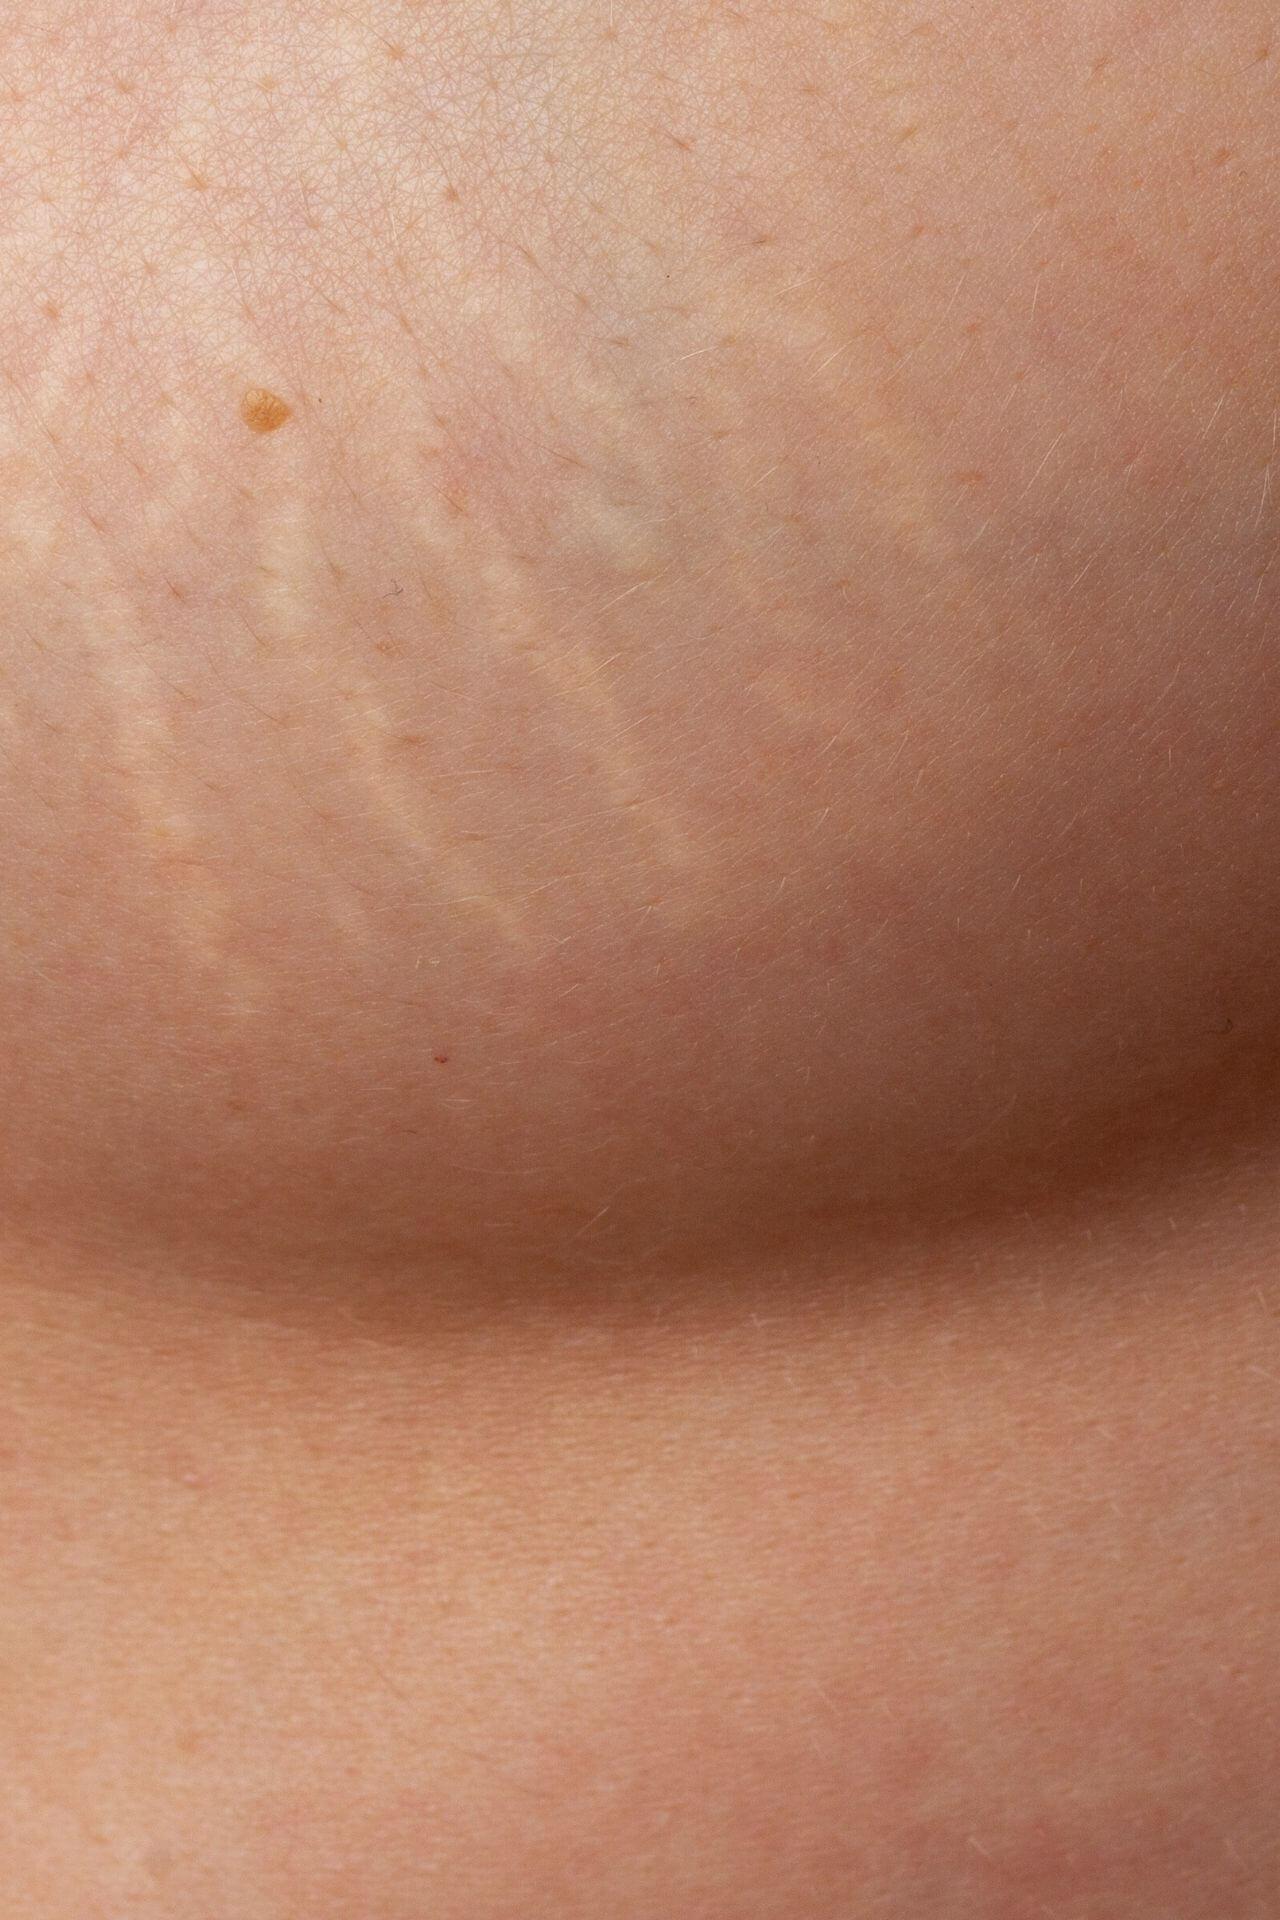 breast scar removal miami skin spa